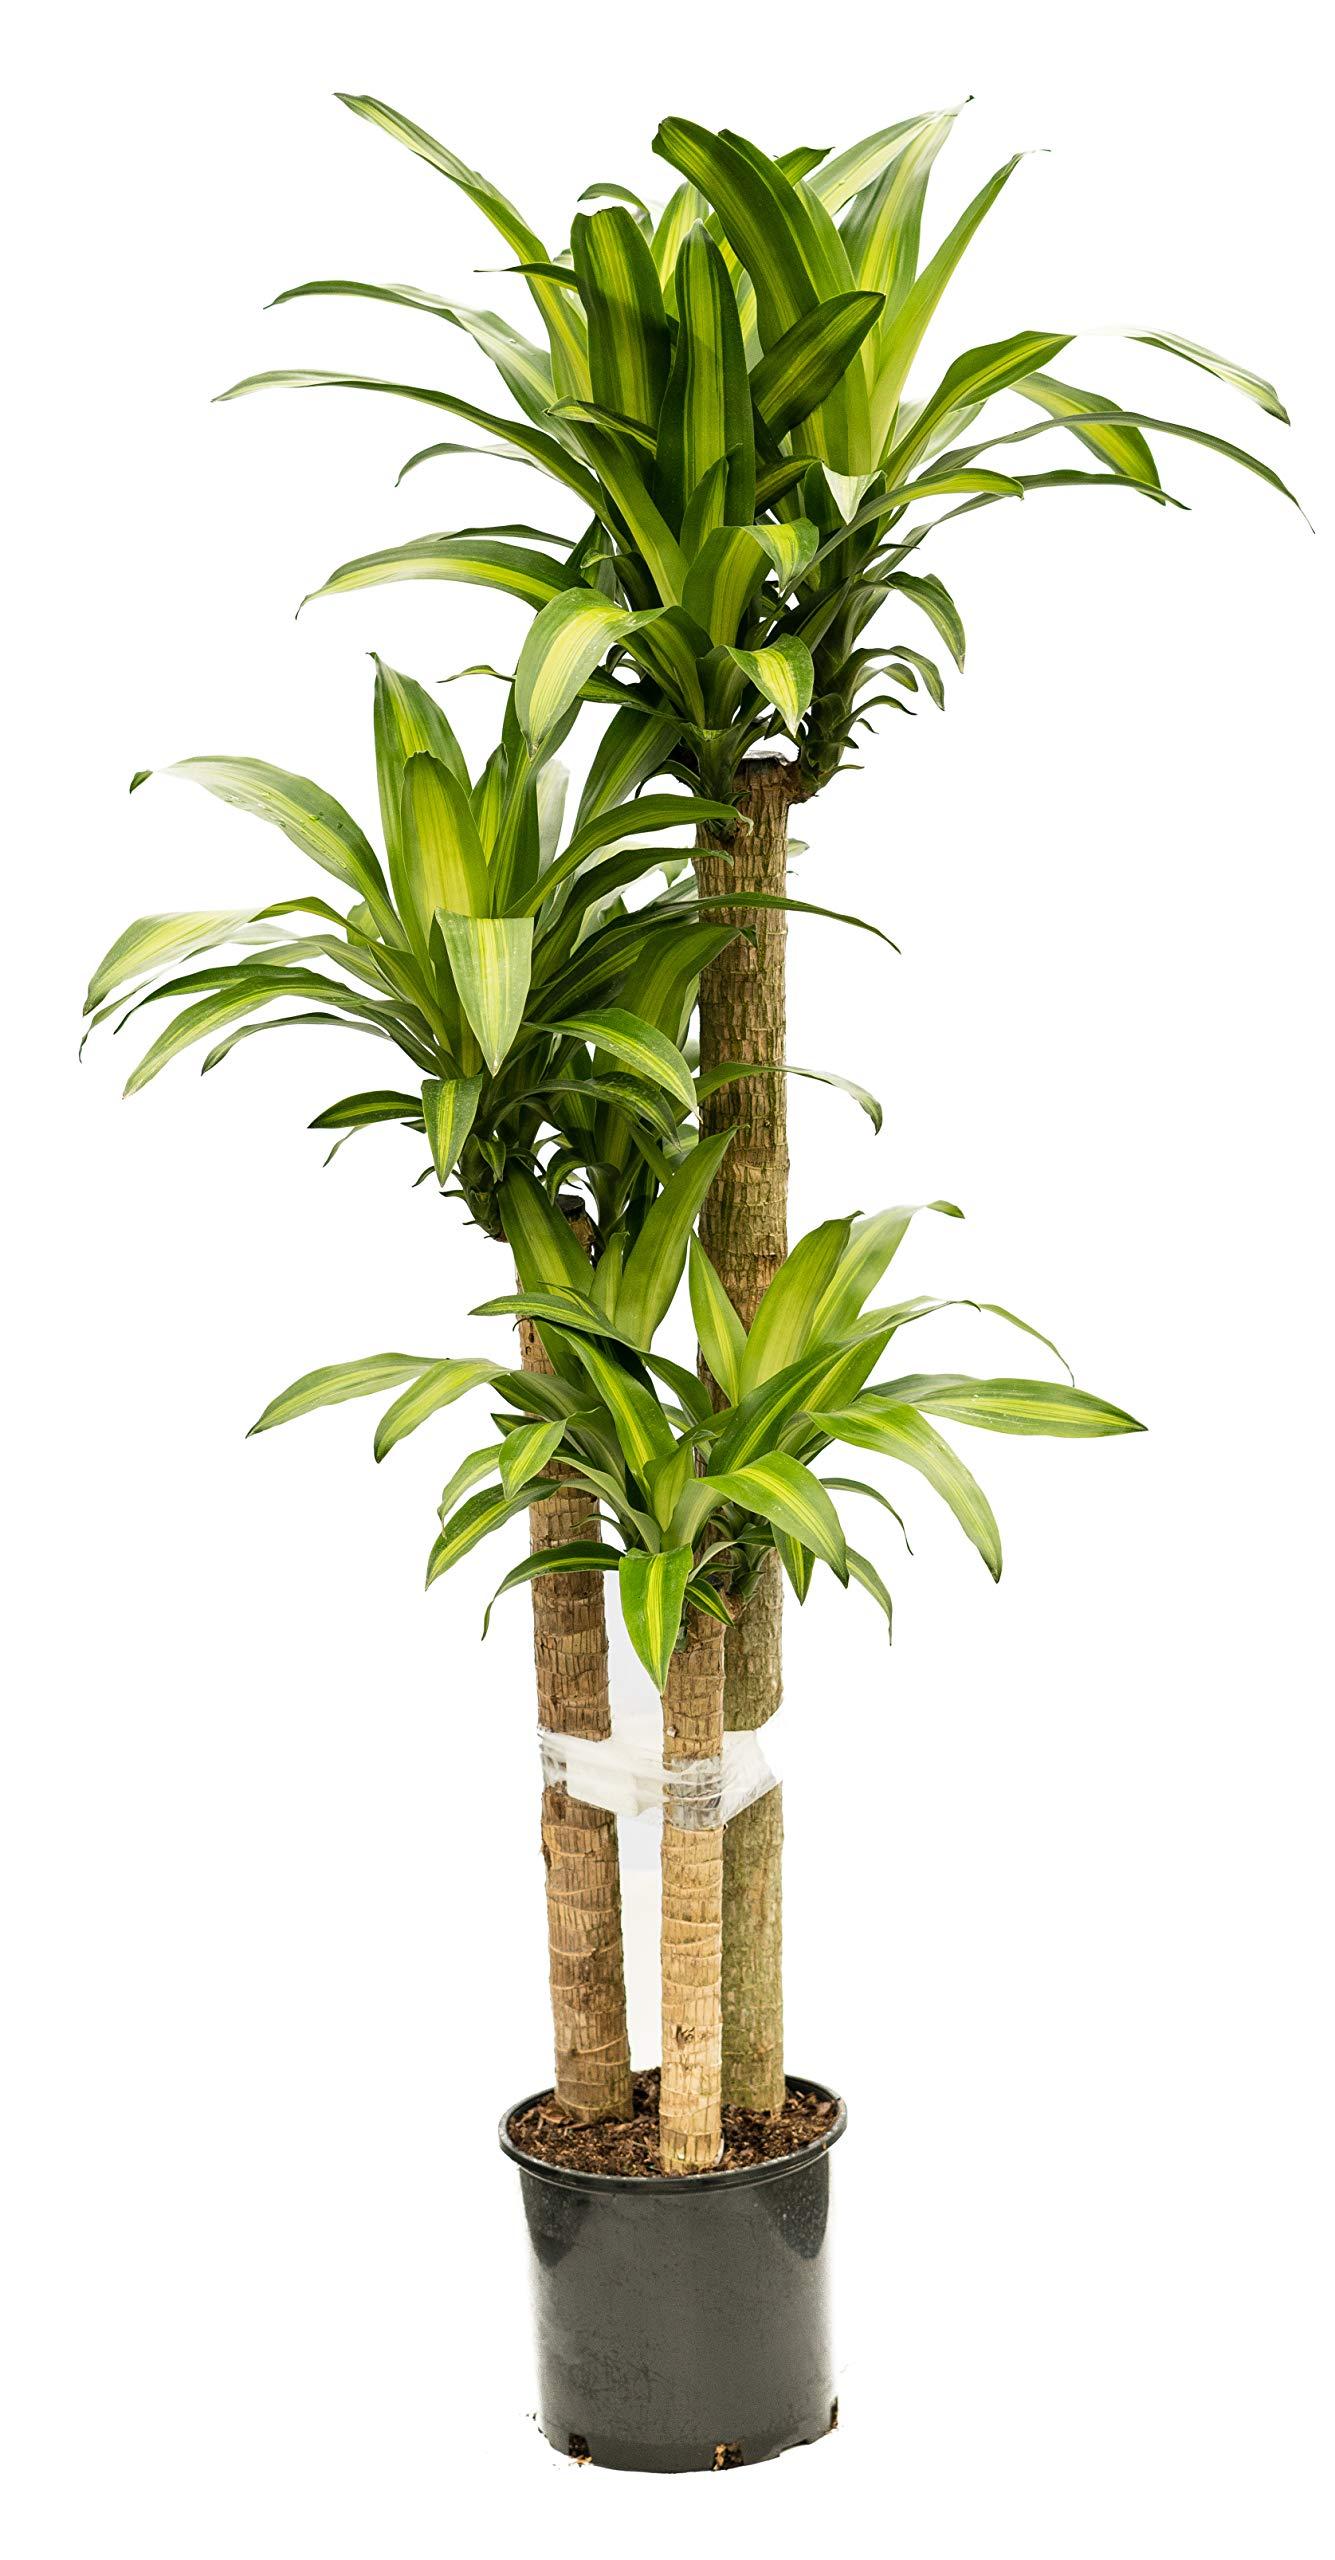 PlantVine Dracaena fragrans 'Massangeana', Corn Plant - Large (4.5-5.5 ft), Cane, Bush - 8-10 Inch Pot (3 Gallon), Live Indoor Plant